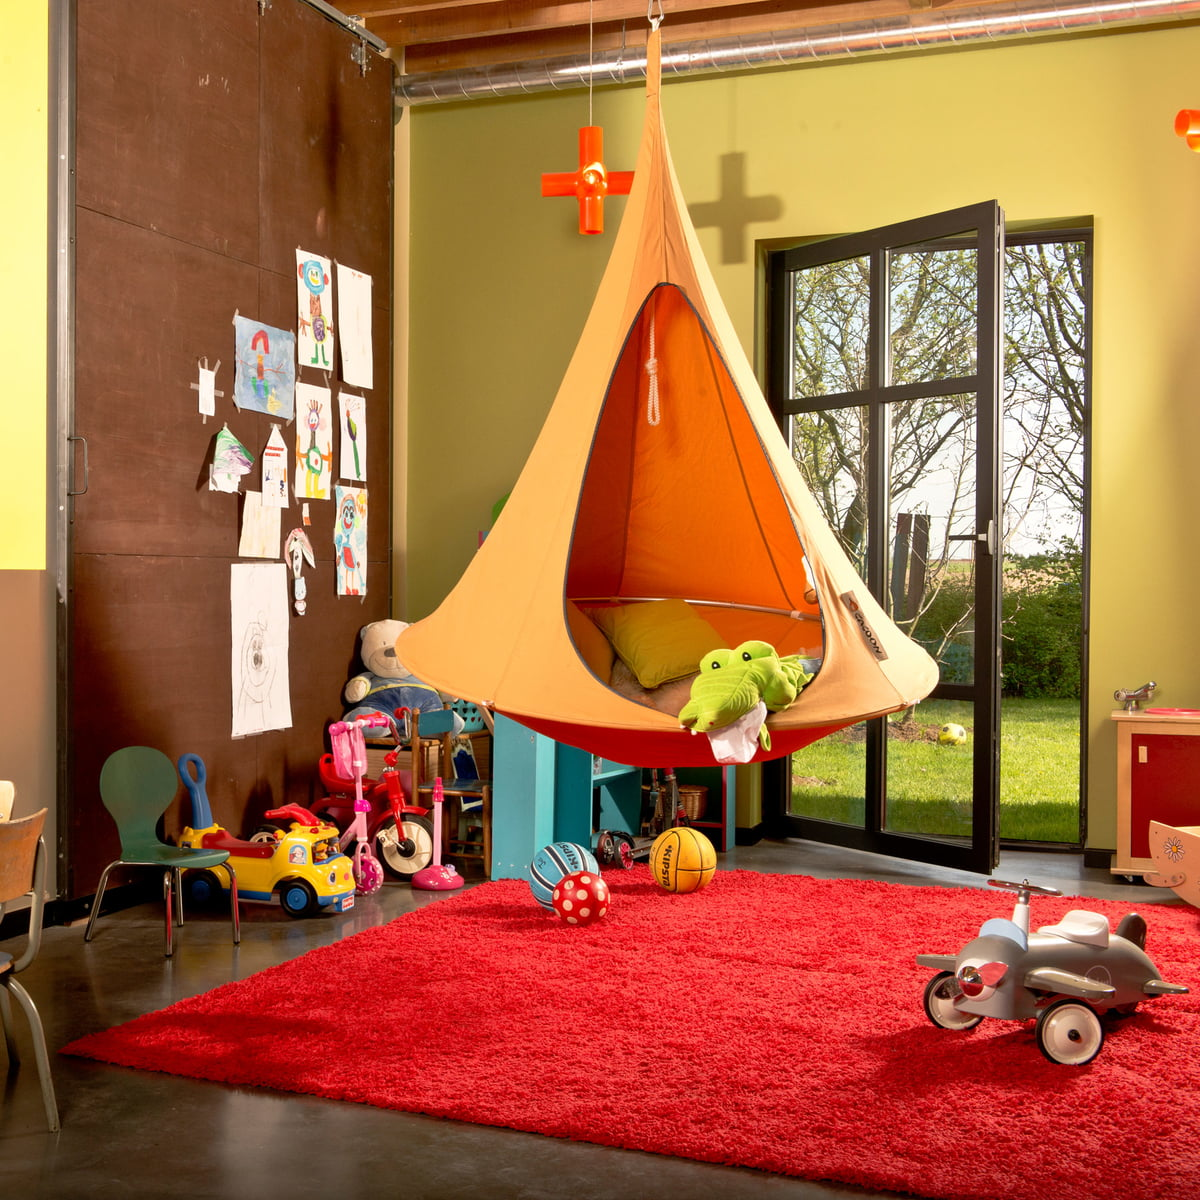 Full Size of Hängesessel Kinderzimmer Single Hngesessel Von Caconnox Regal Sofa Weiß Regale Garten Kinderzimmer Hängesessel Kinderzimmer